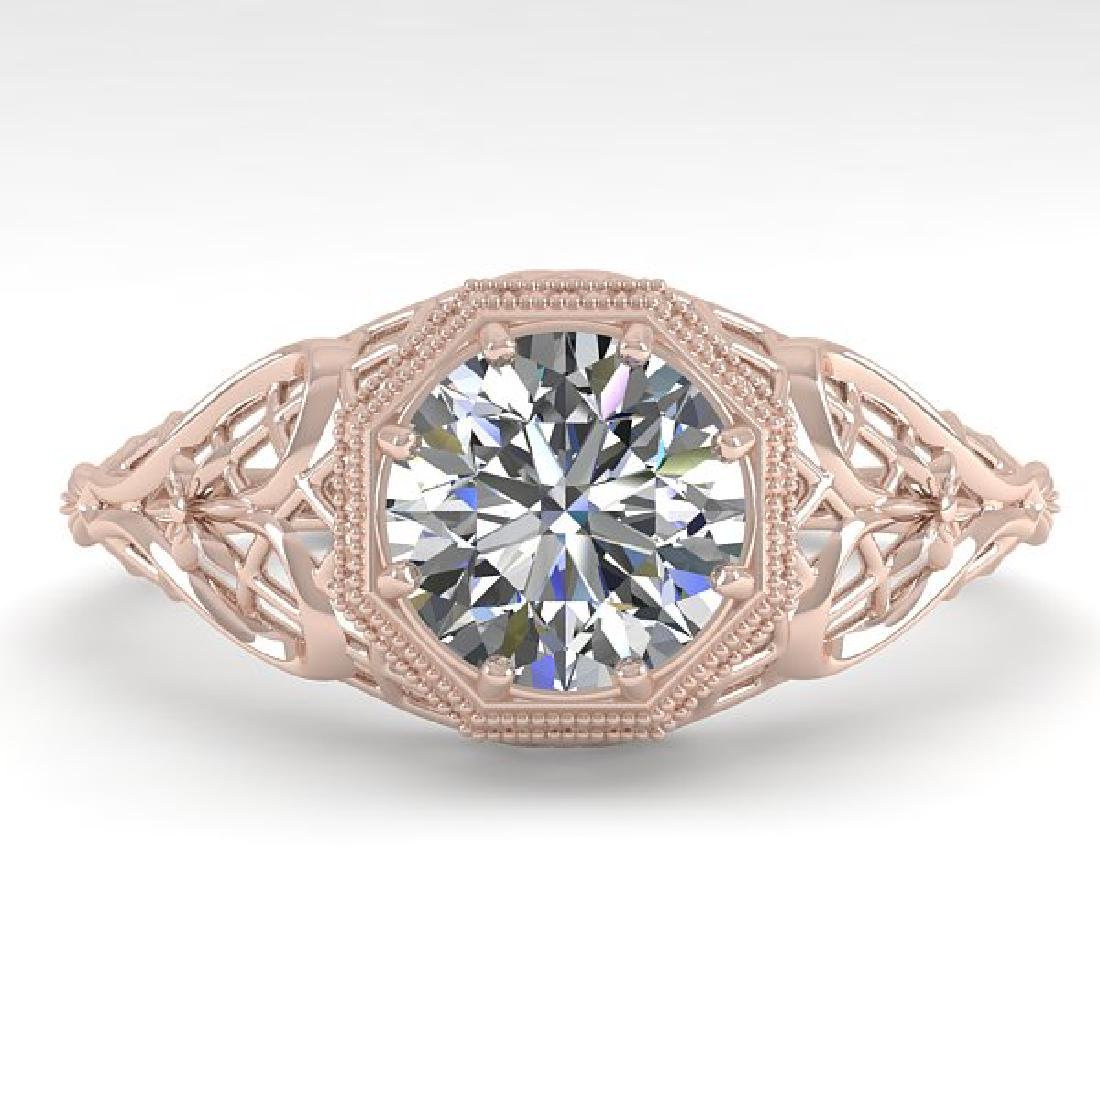 1.0 CTW VS/SI Diamond Solitaire Ring 14K Rose Gold